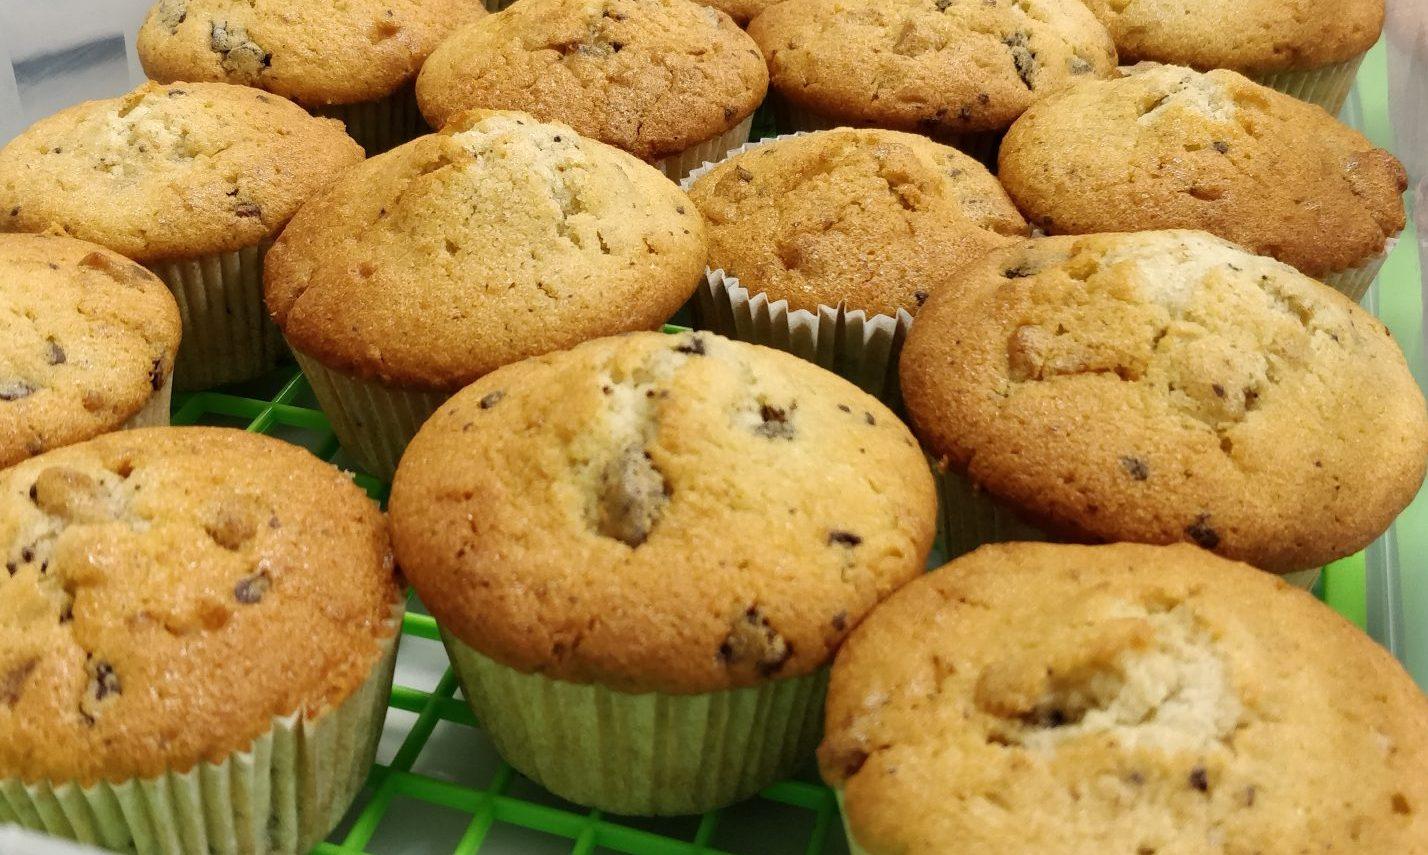 Zartbitter Walnuss Cupcakes